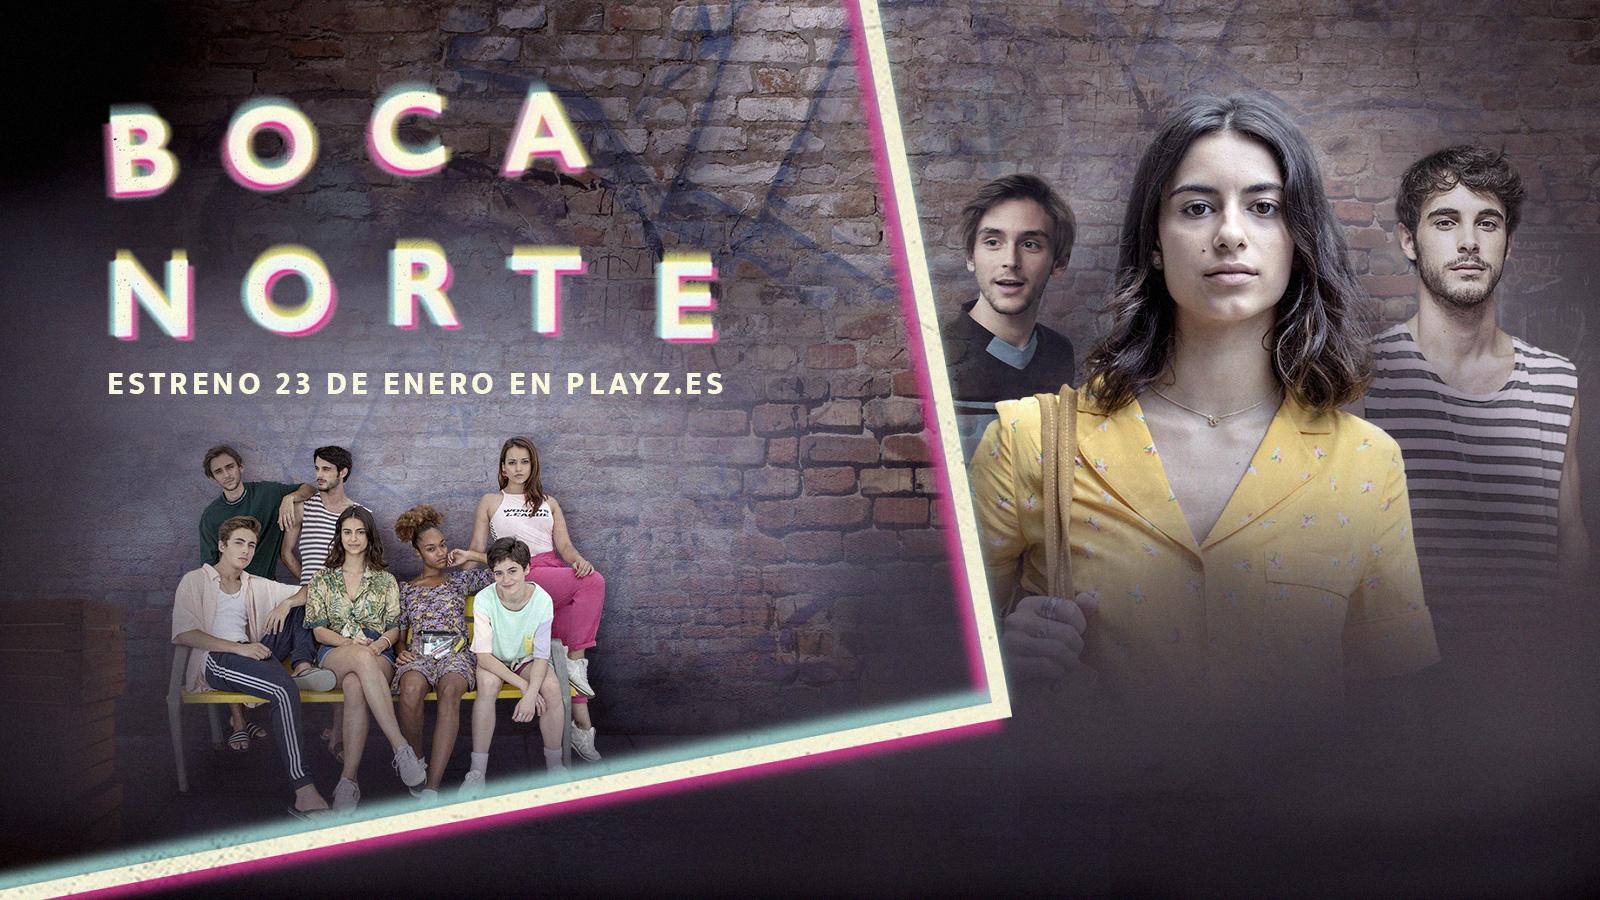 Telediario - 'Boca Norte', la nueva serie de Playz, se estrena este 23 de enero